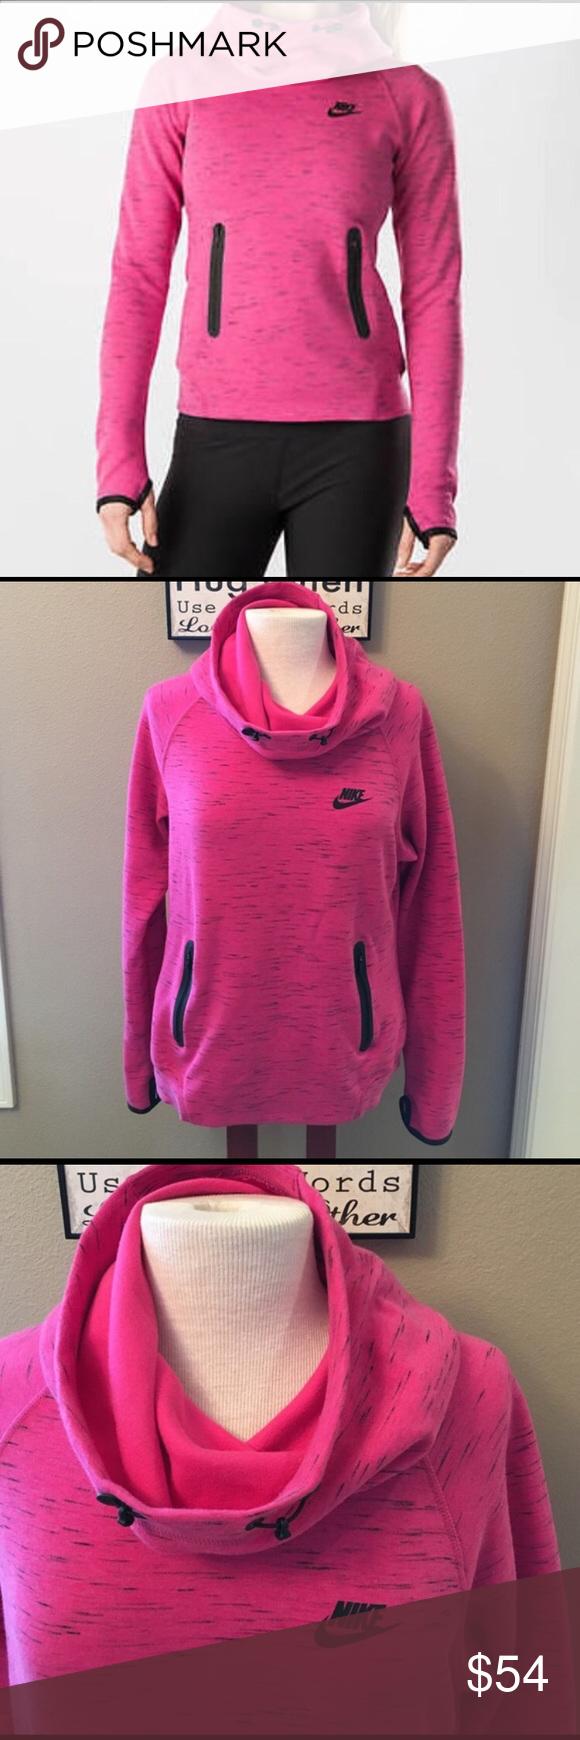 Nike Tech Fleece Hoodie, Sz L Beautiful pink and black